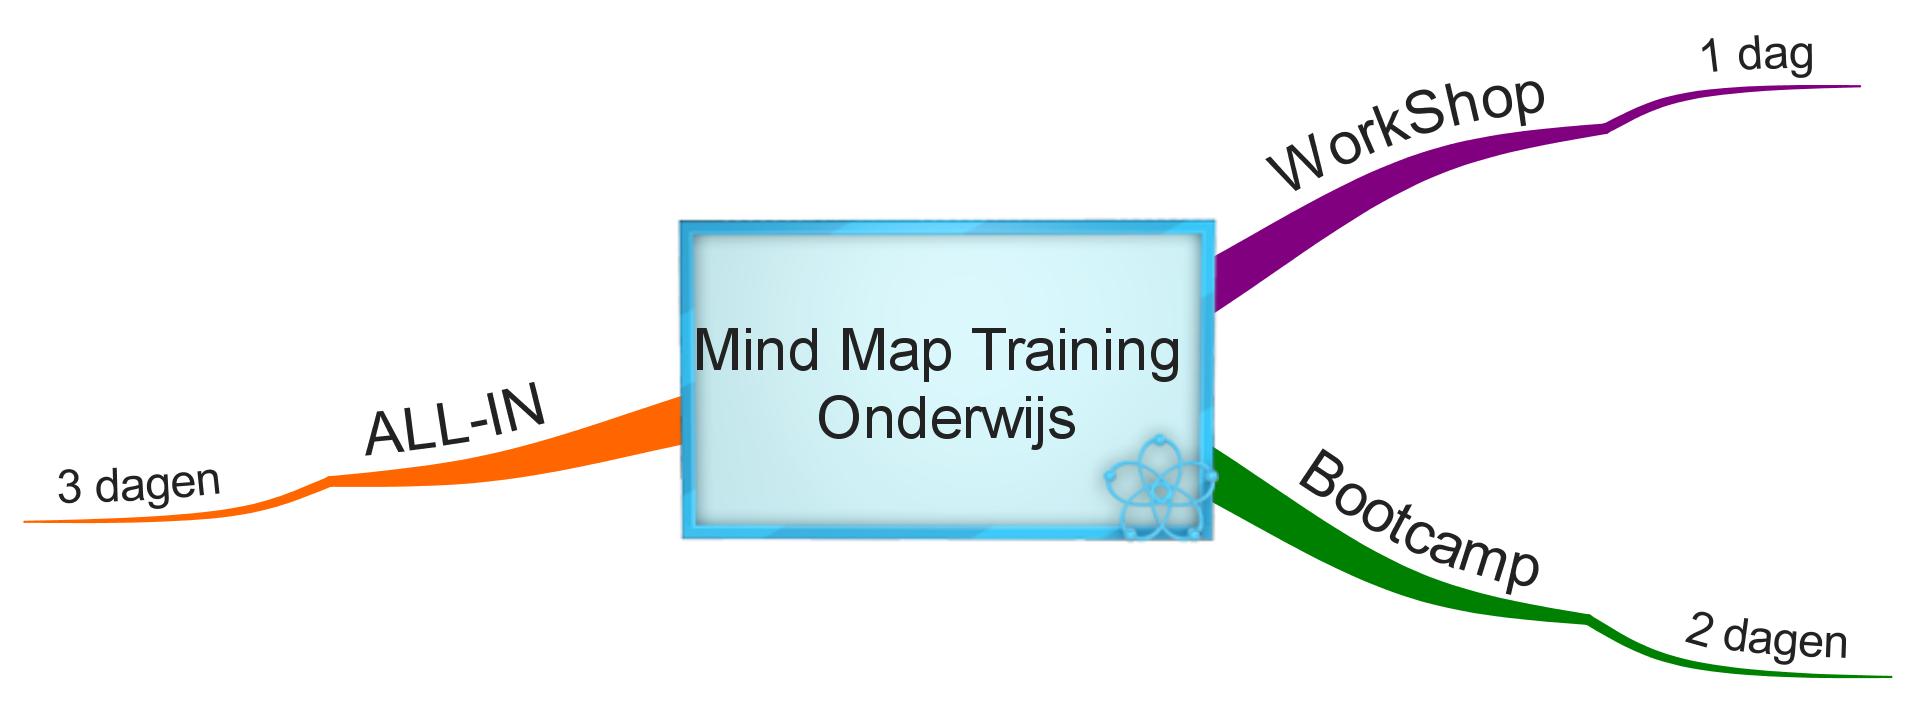 Mind Map Training Onderwijs